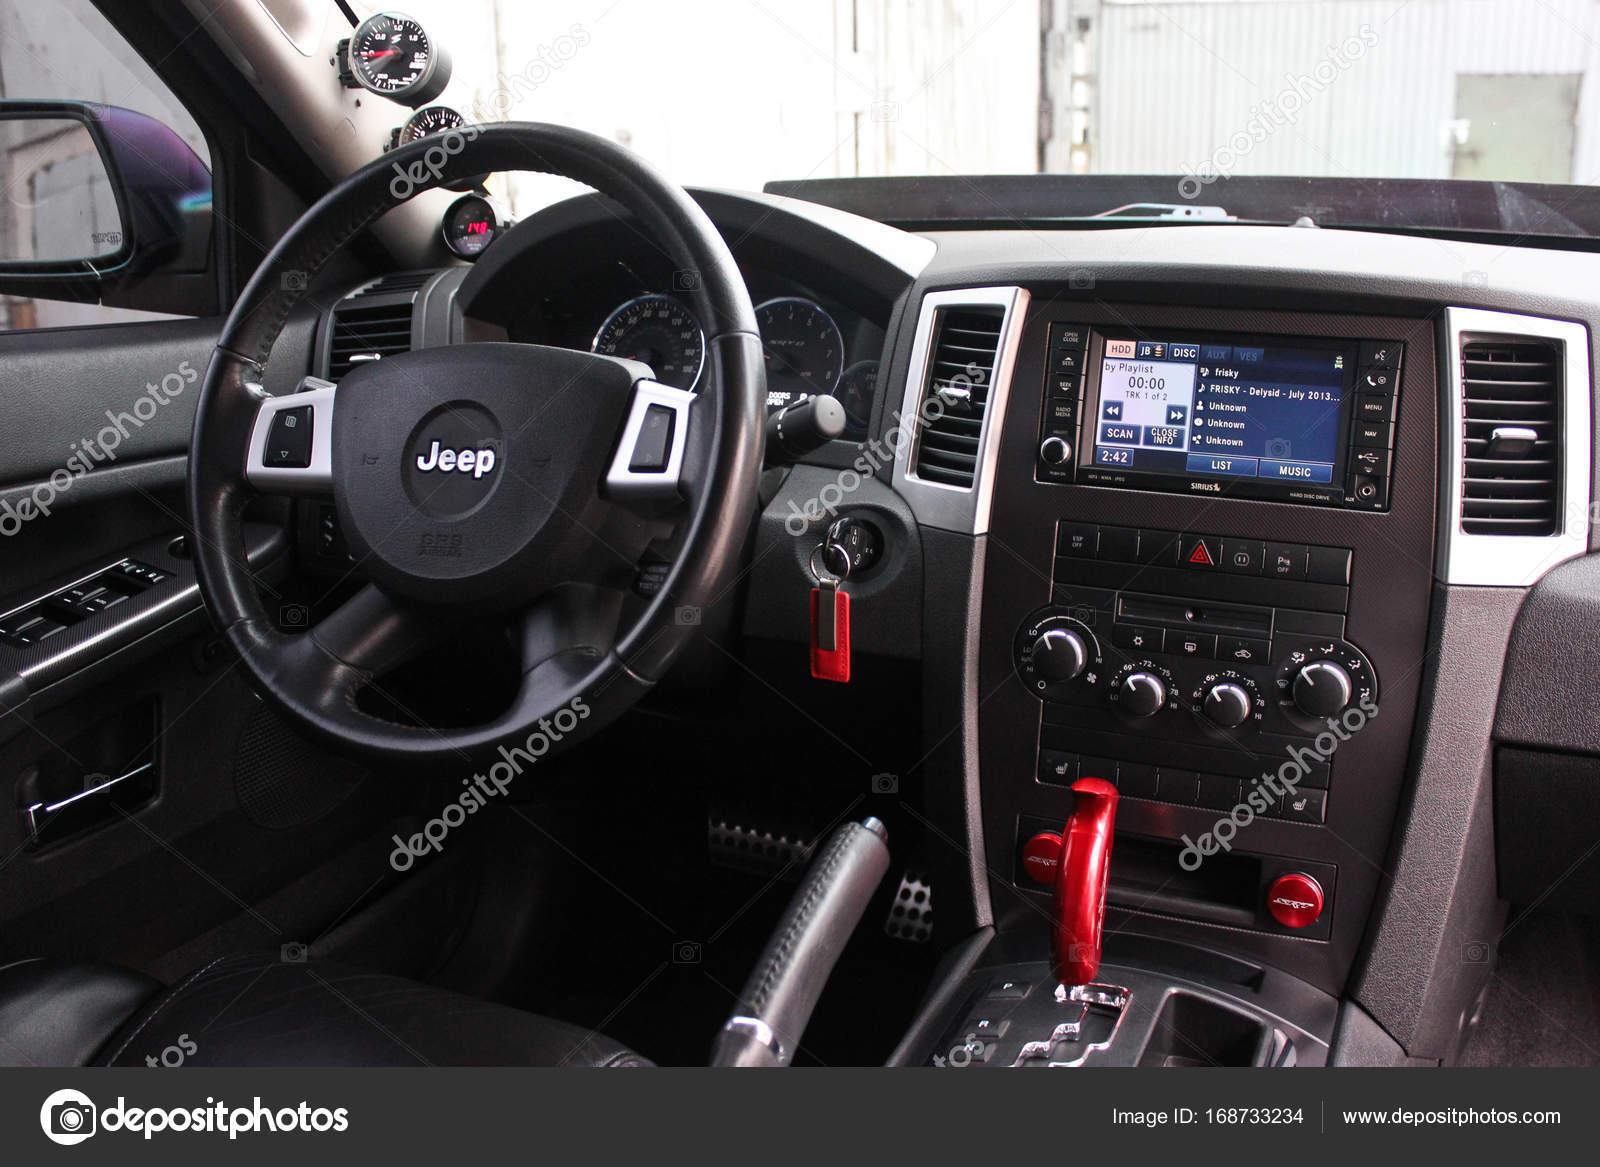 4. September 2012, Kiew. Jeep Grand Cherokee Srt8. Auto Innenraum ...